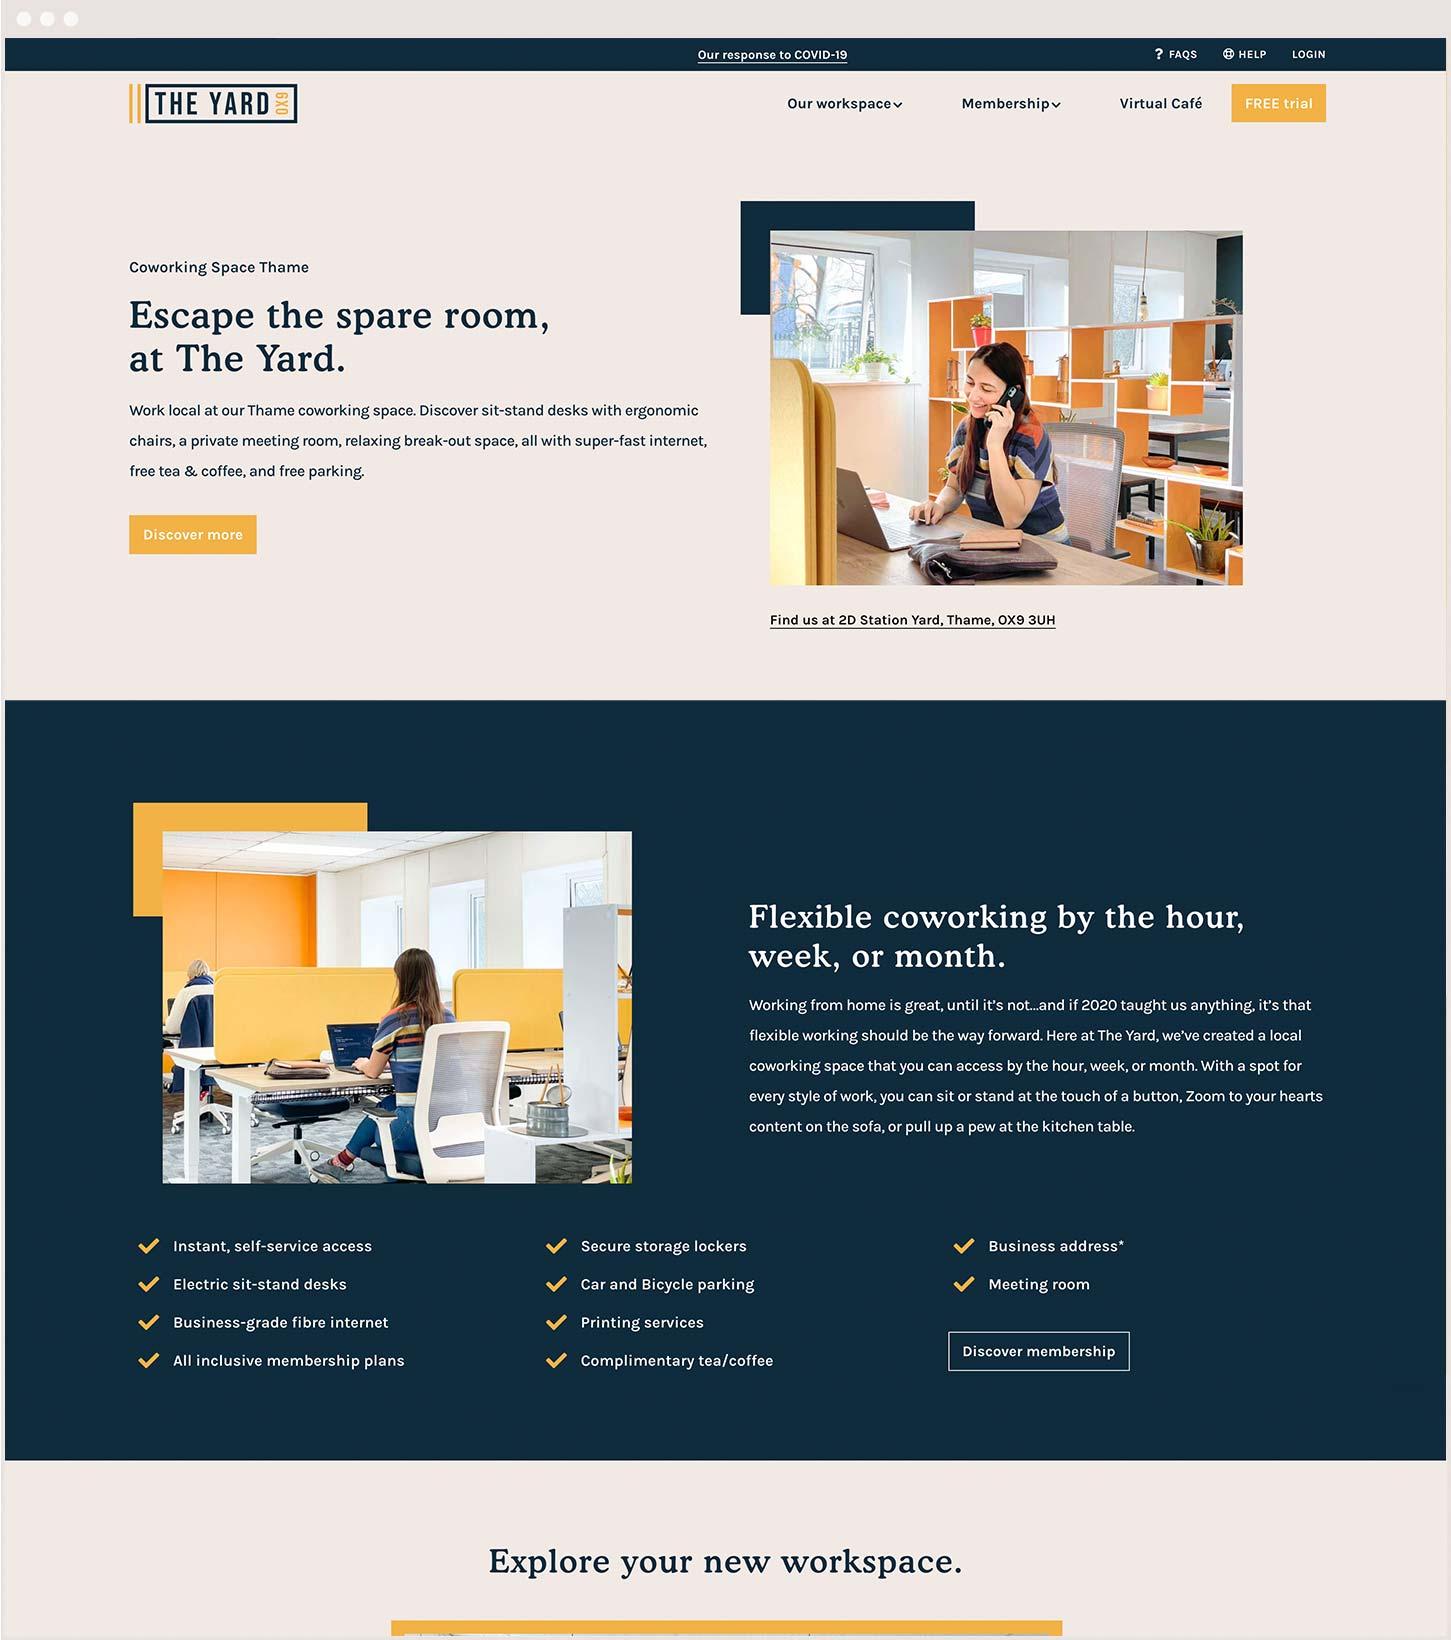 The yard website design